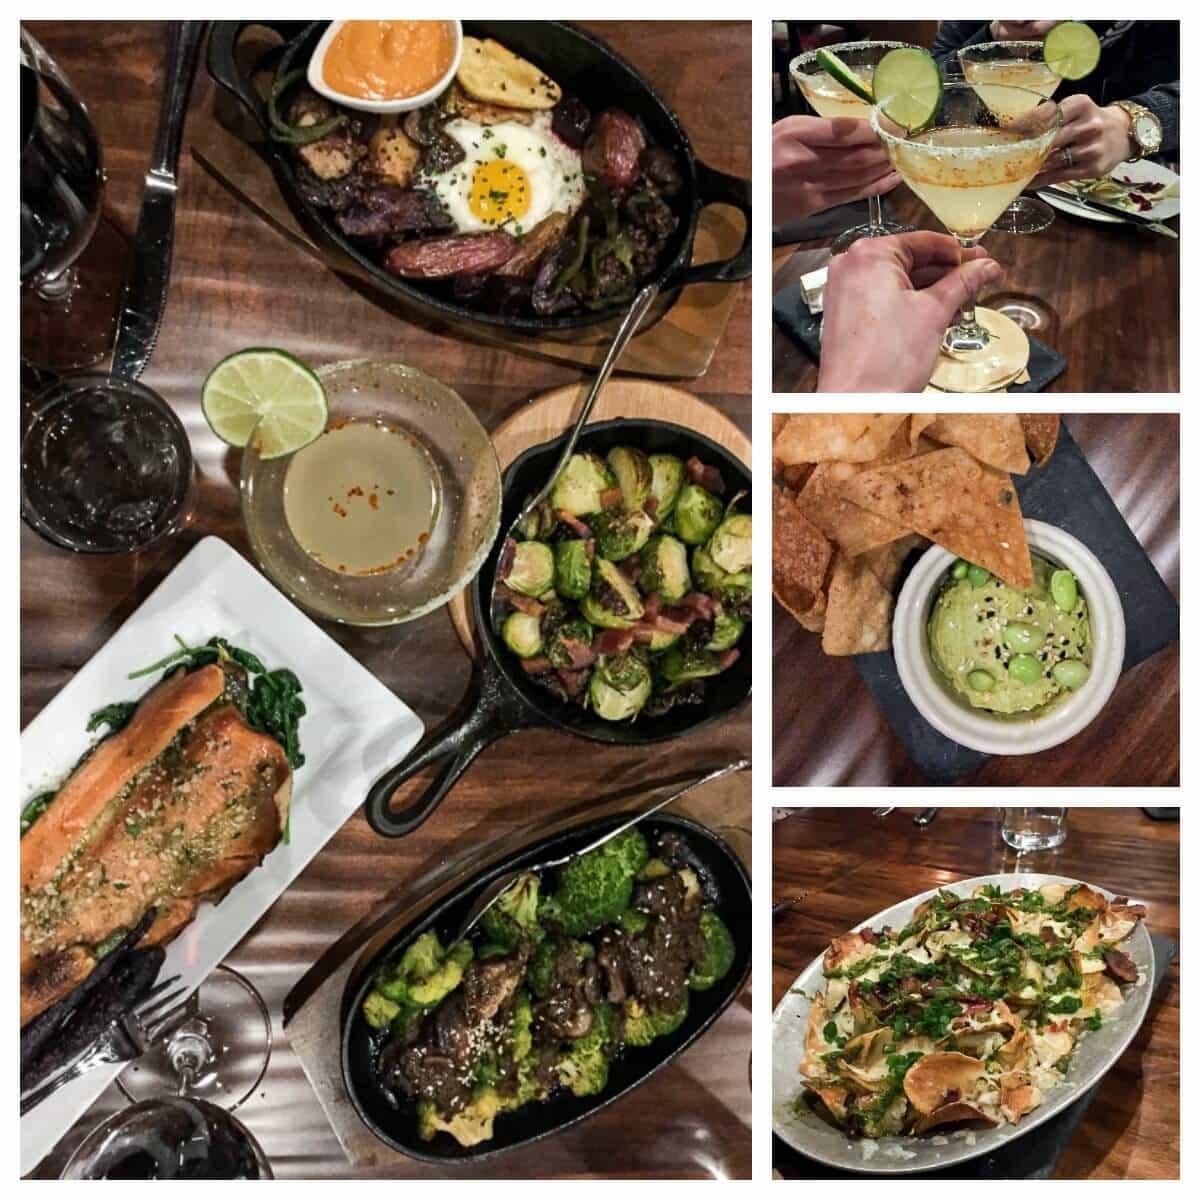 Brass-Tag-Restaurant-Dinner-Deer-Valley-Utah